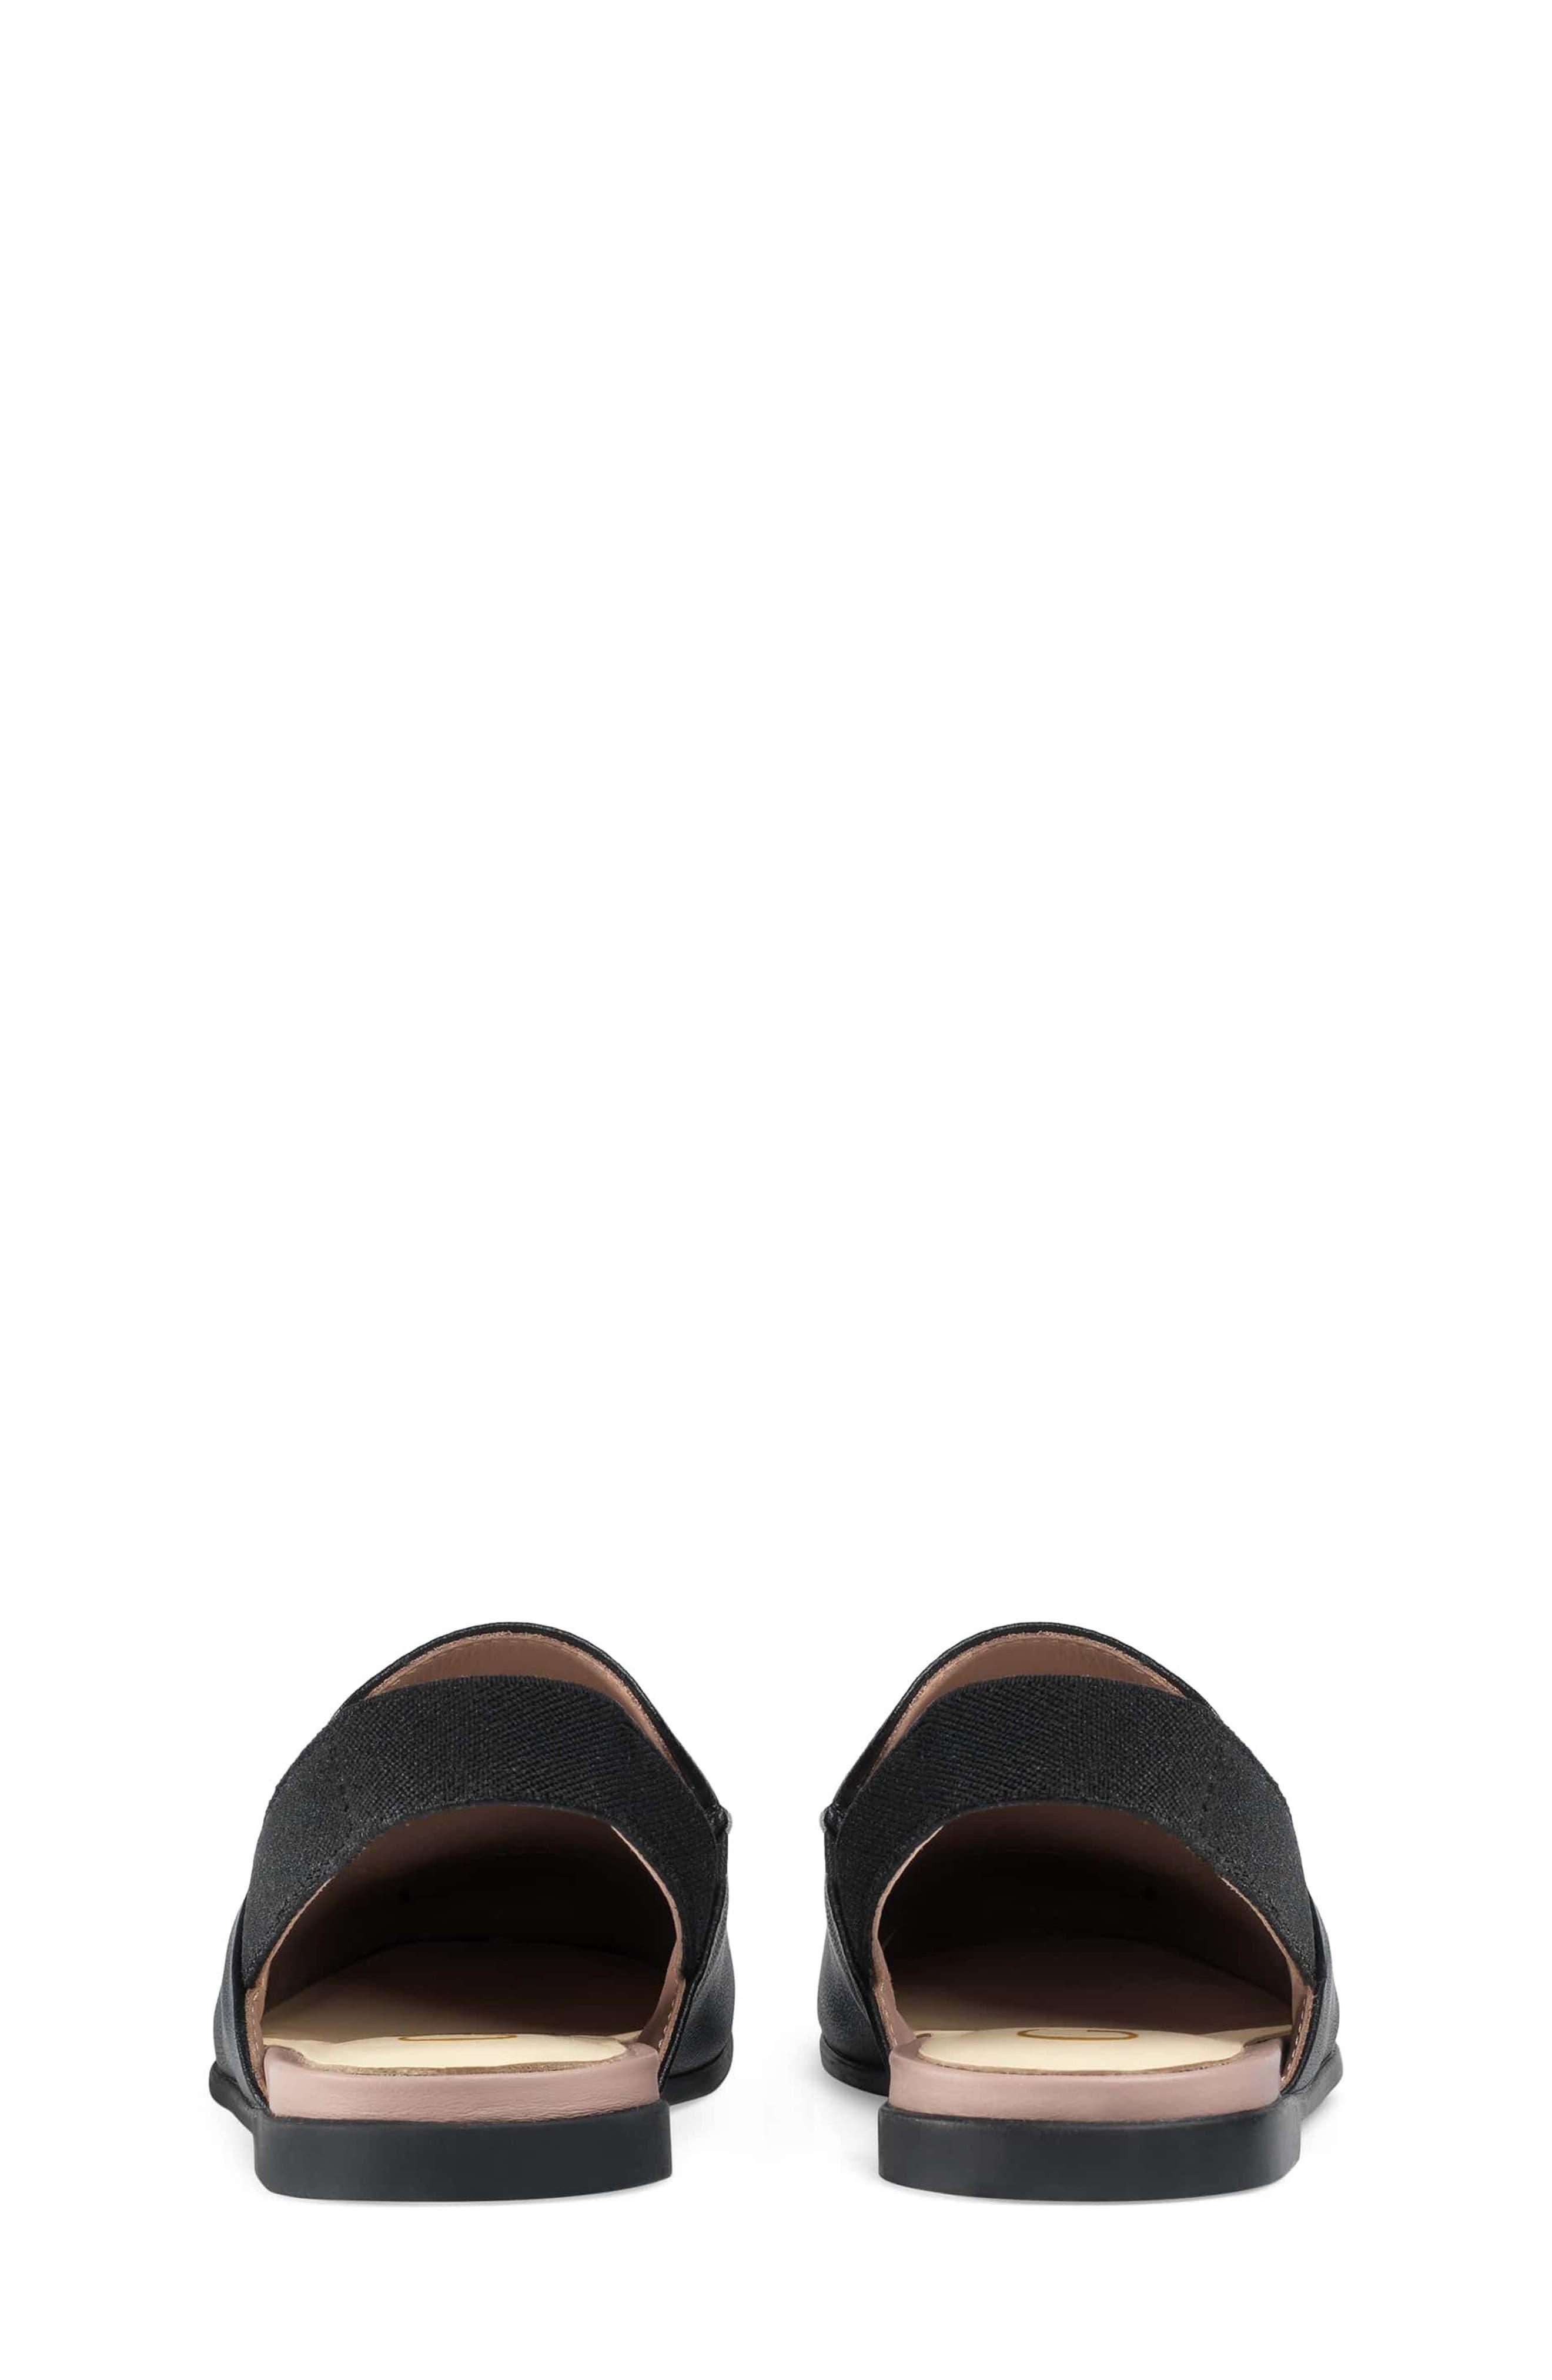 Princetown Loafer Mule,                             Alternate thumbnail 8, color,                             BLACK/ BLACK